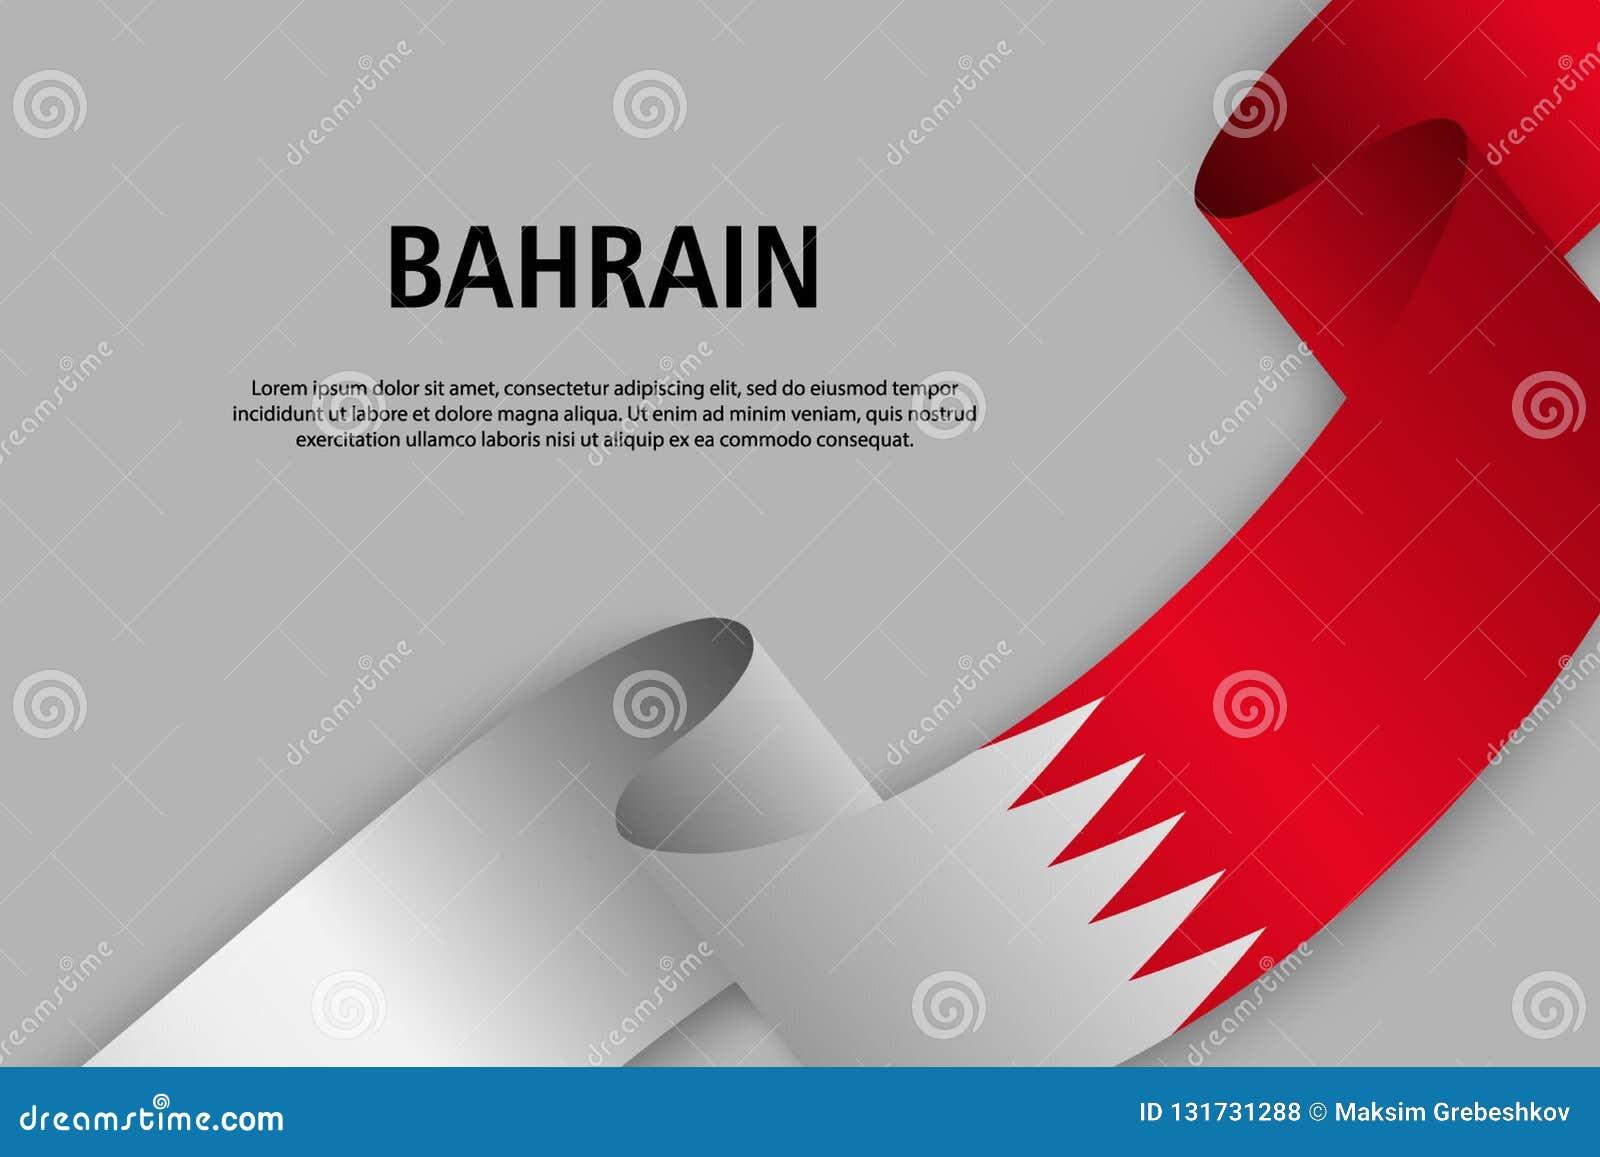 Ruban de ondulation avec le drapeau du Bahrain,